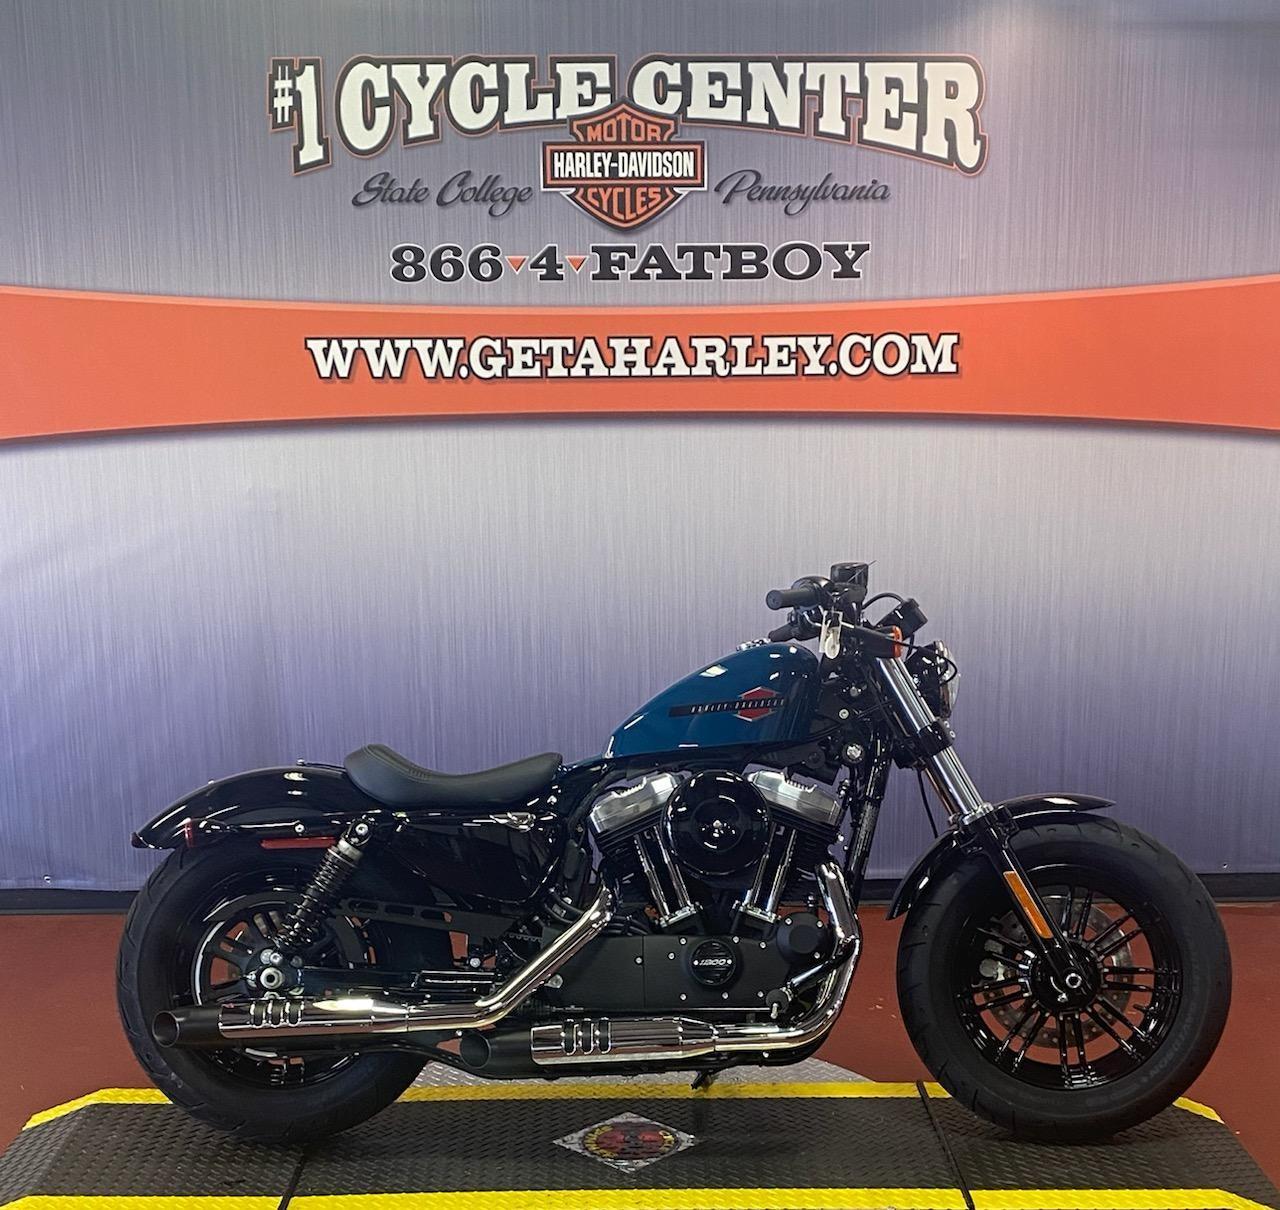 2021 Harley-Davidson Cruiser XL 1200X Forty-Eight at #1 Cycle Center Harley-Davidson